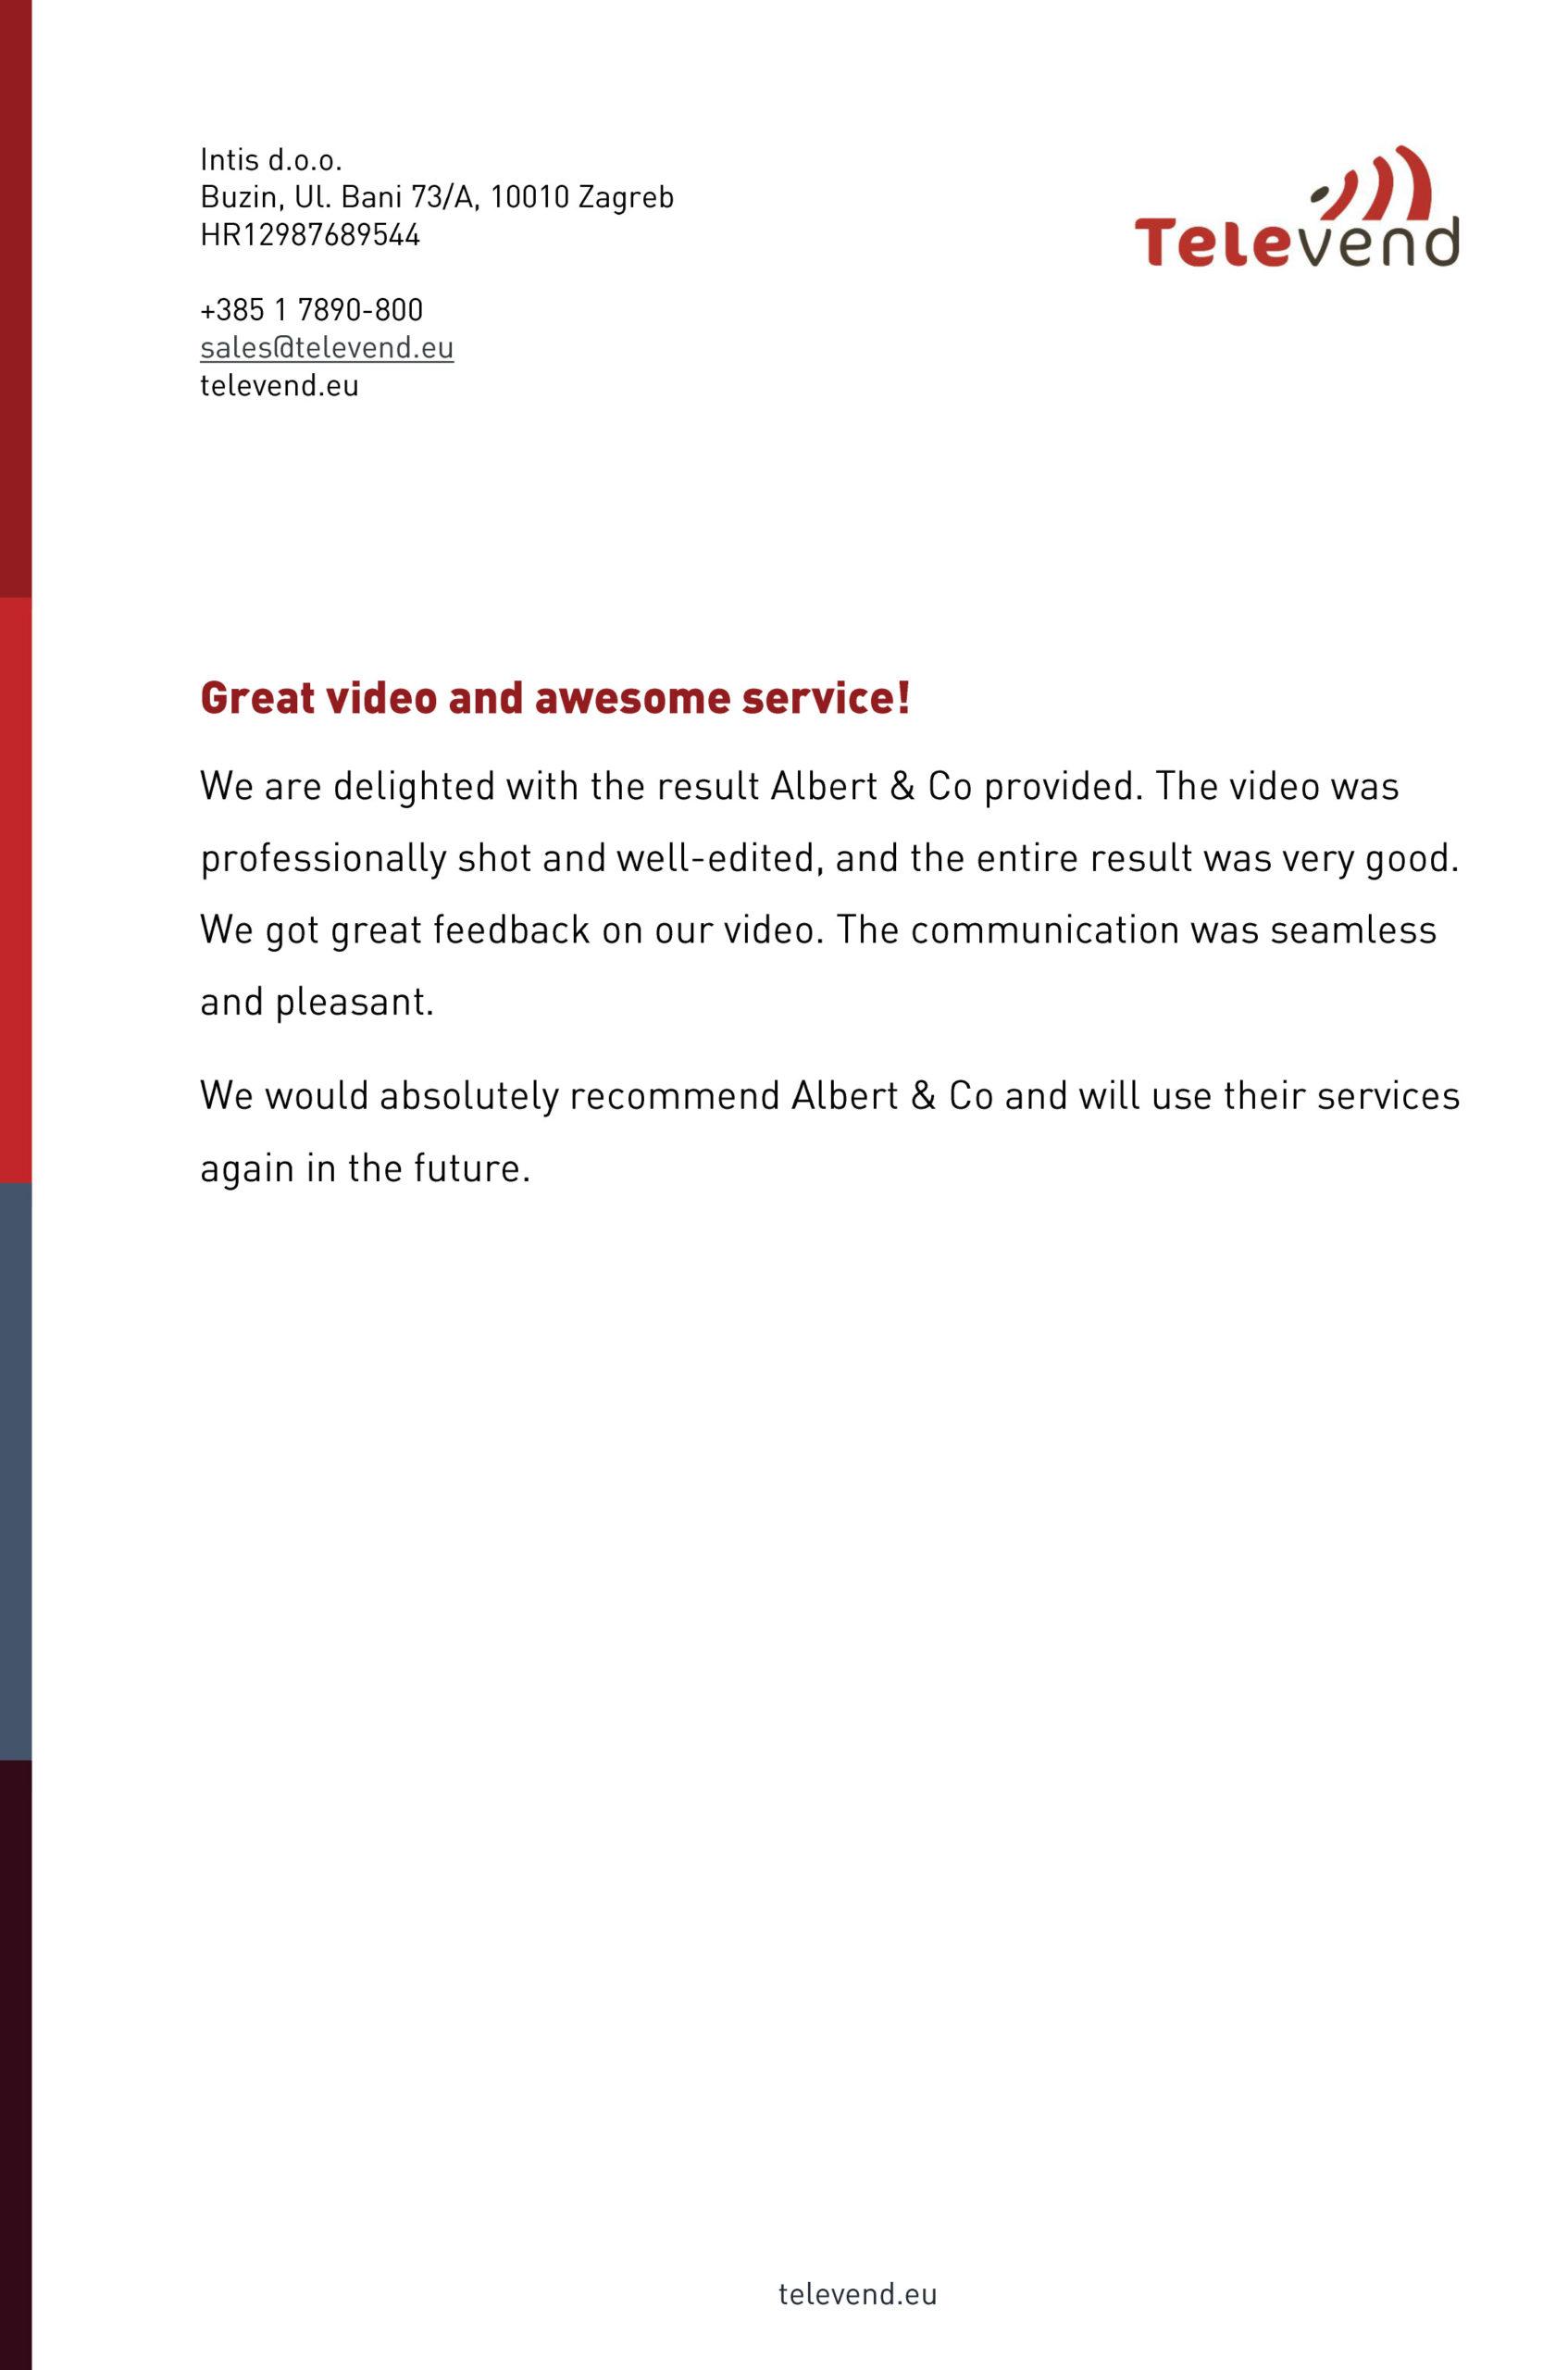 Albert& Co отзыв от компании Televend (Zagreb)